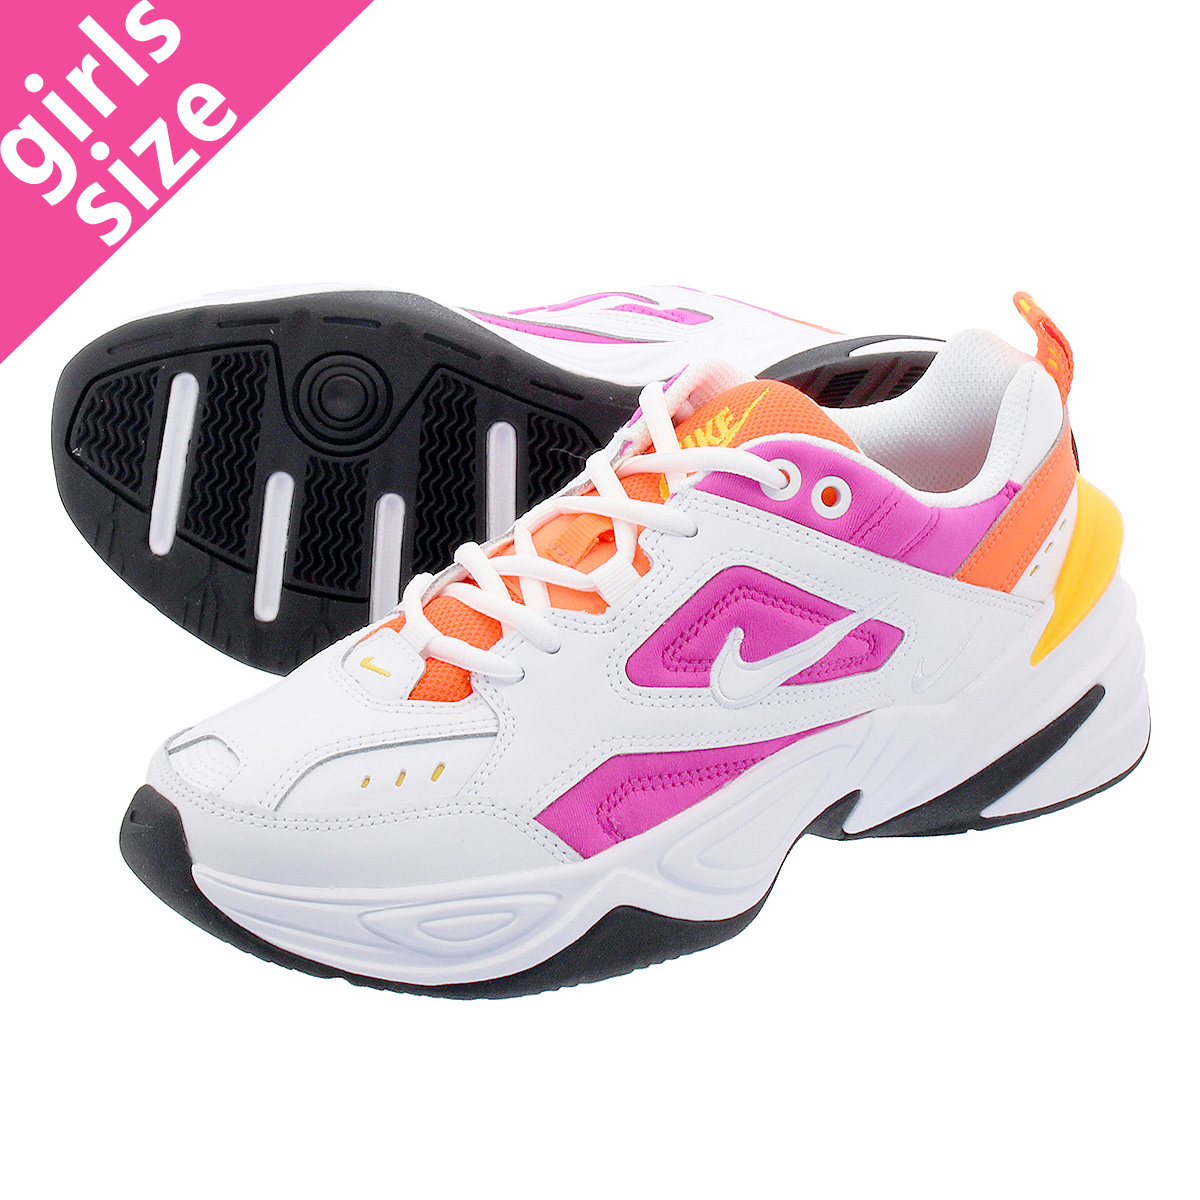 low priced 25b8c 24753 NIKE WMNS M2K TEKNO Nike women M2K techno WHITE LASER FUCHSIA HYPER CRIMSON  ao3108-104